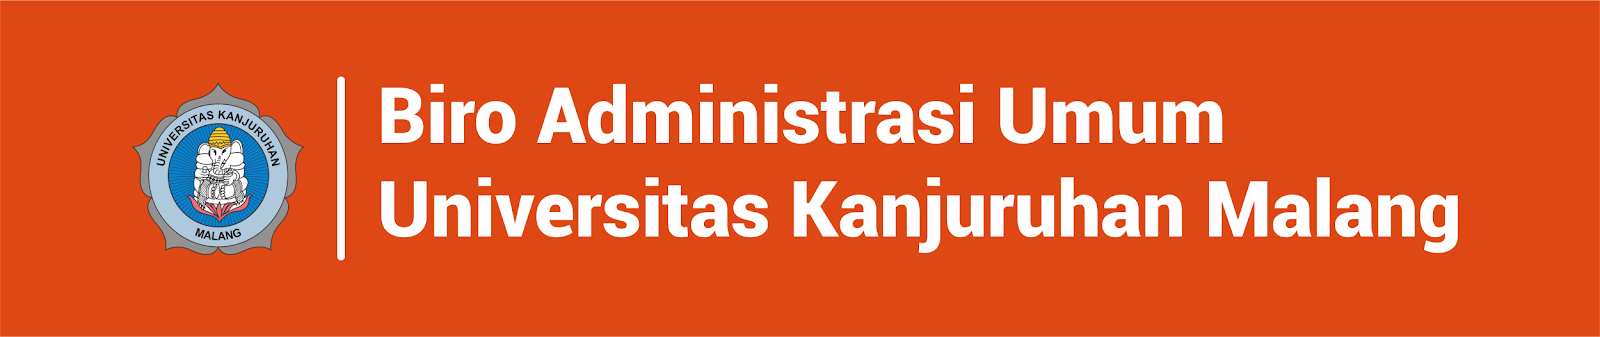 Biro Administrasi Umum Universitas Kanjuruhan Malang